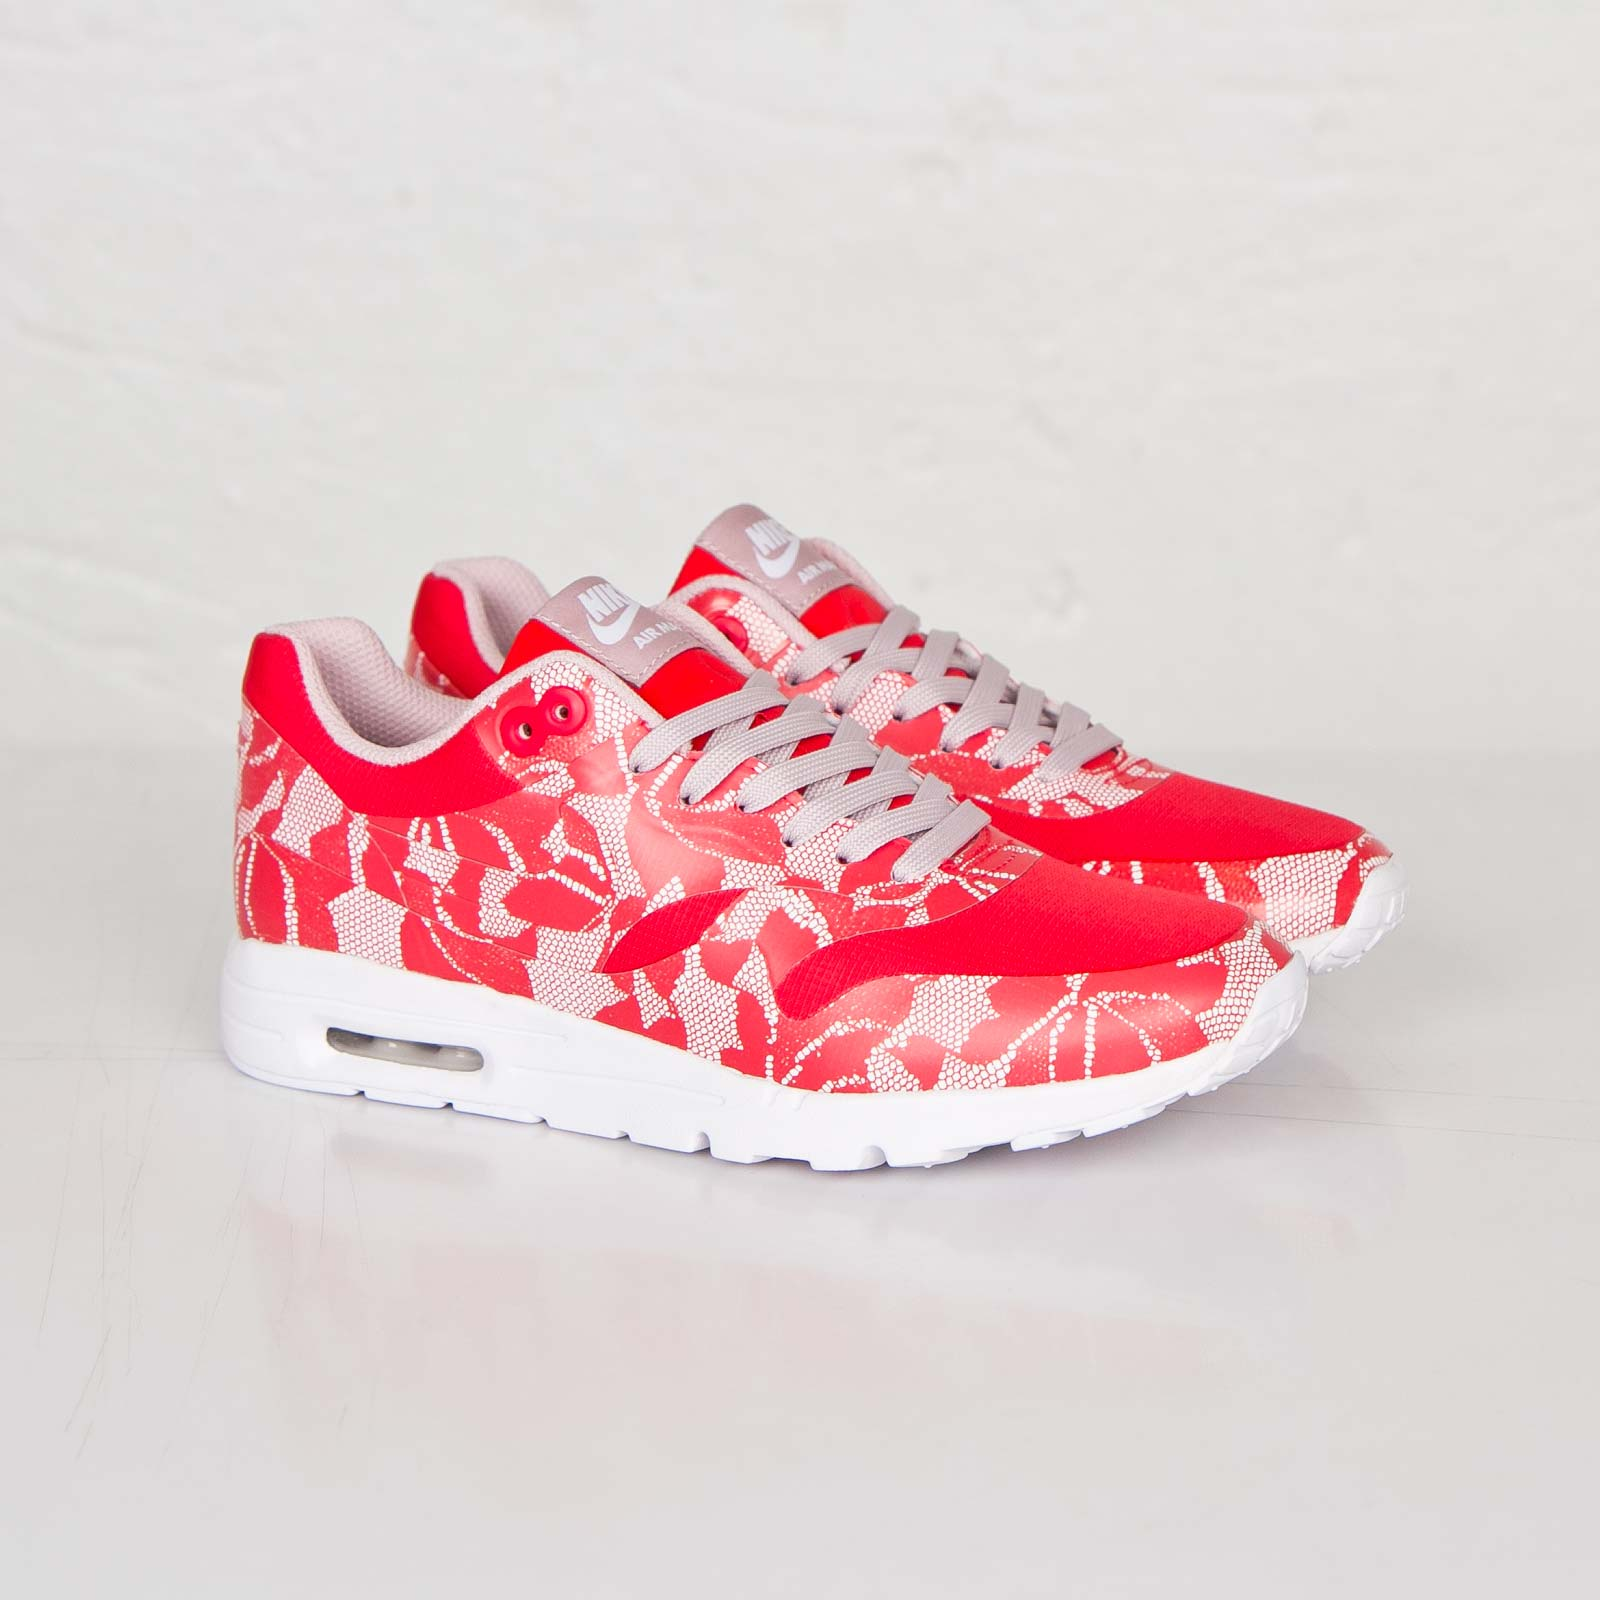 Nike Wmns Air Max 1 Ultra SP 789564 661 Sneakersnstuff